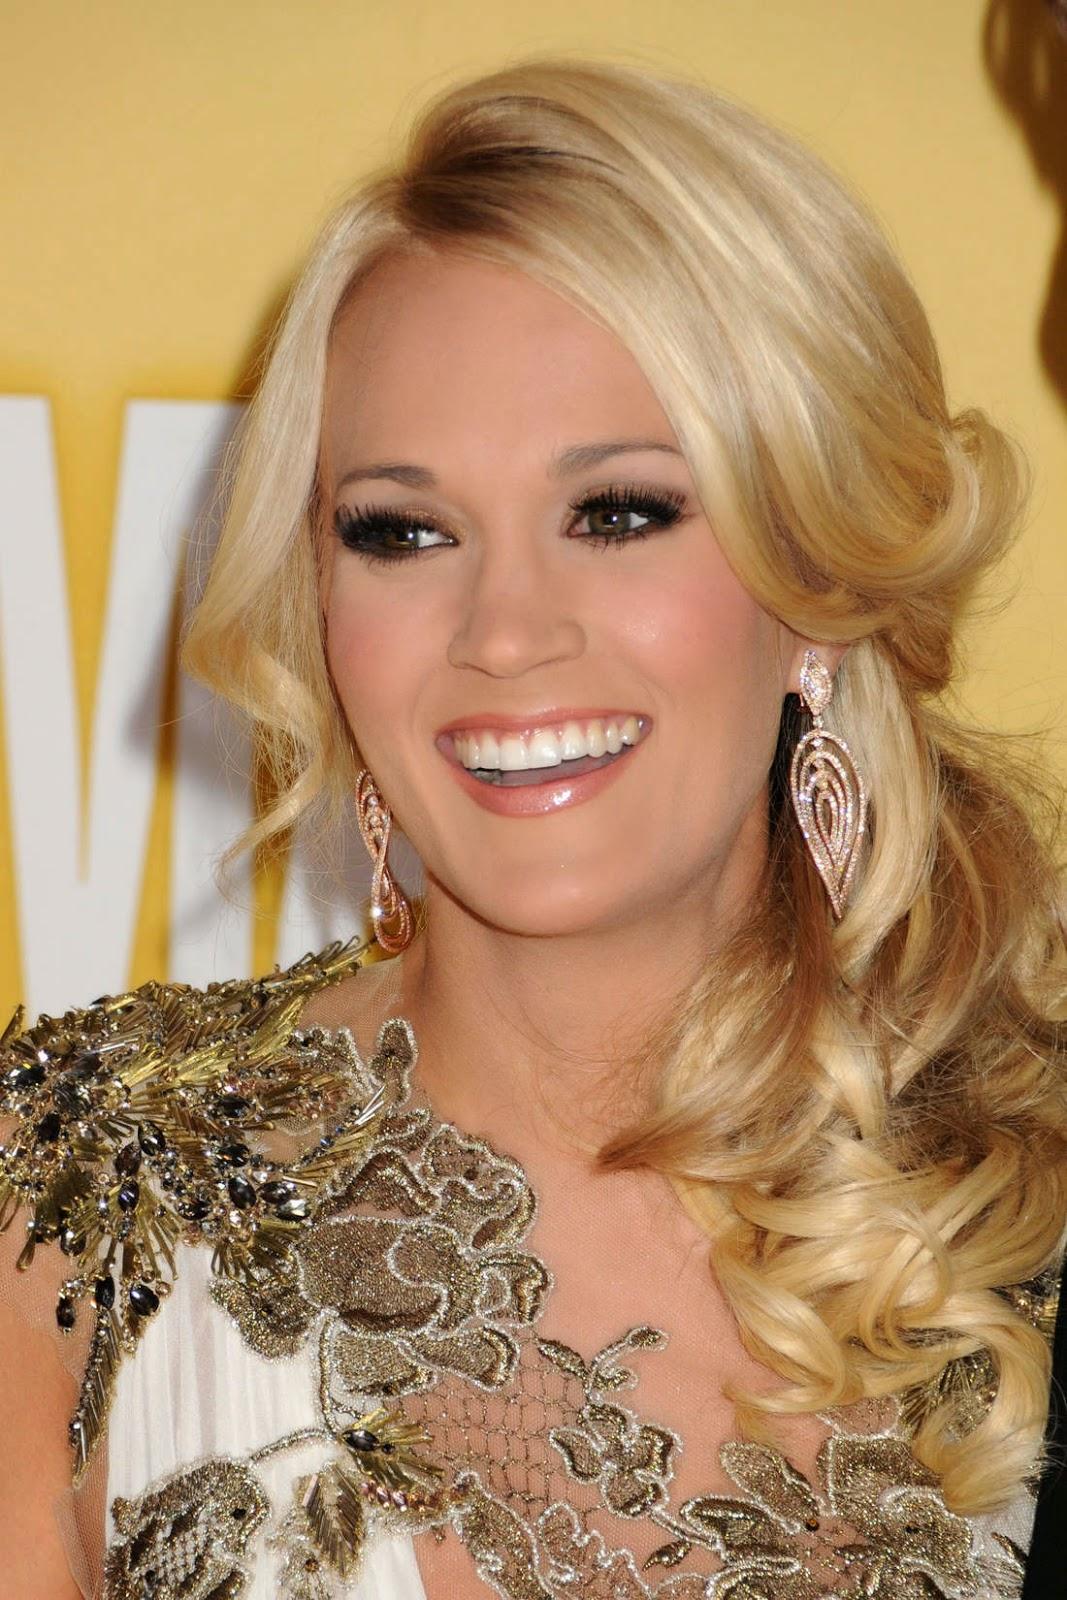 Carrie Underwood Makeup Carrie Underwood wears to